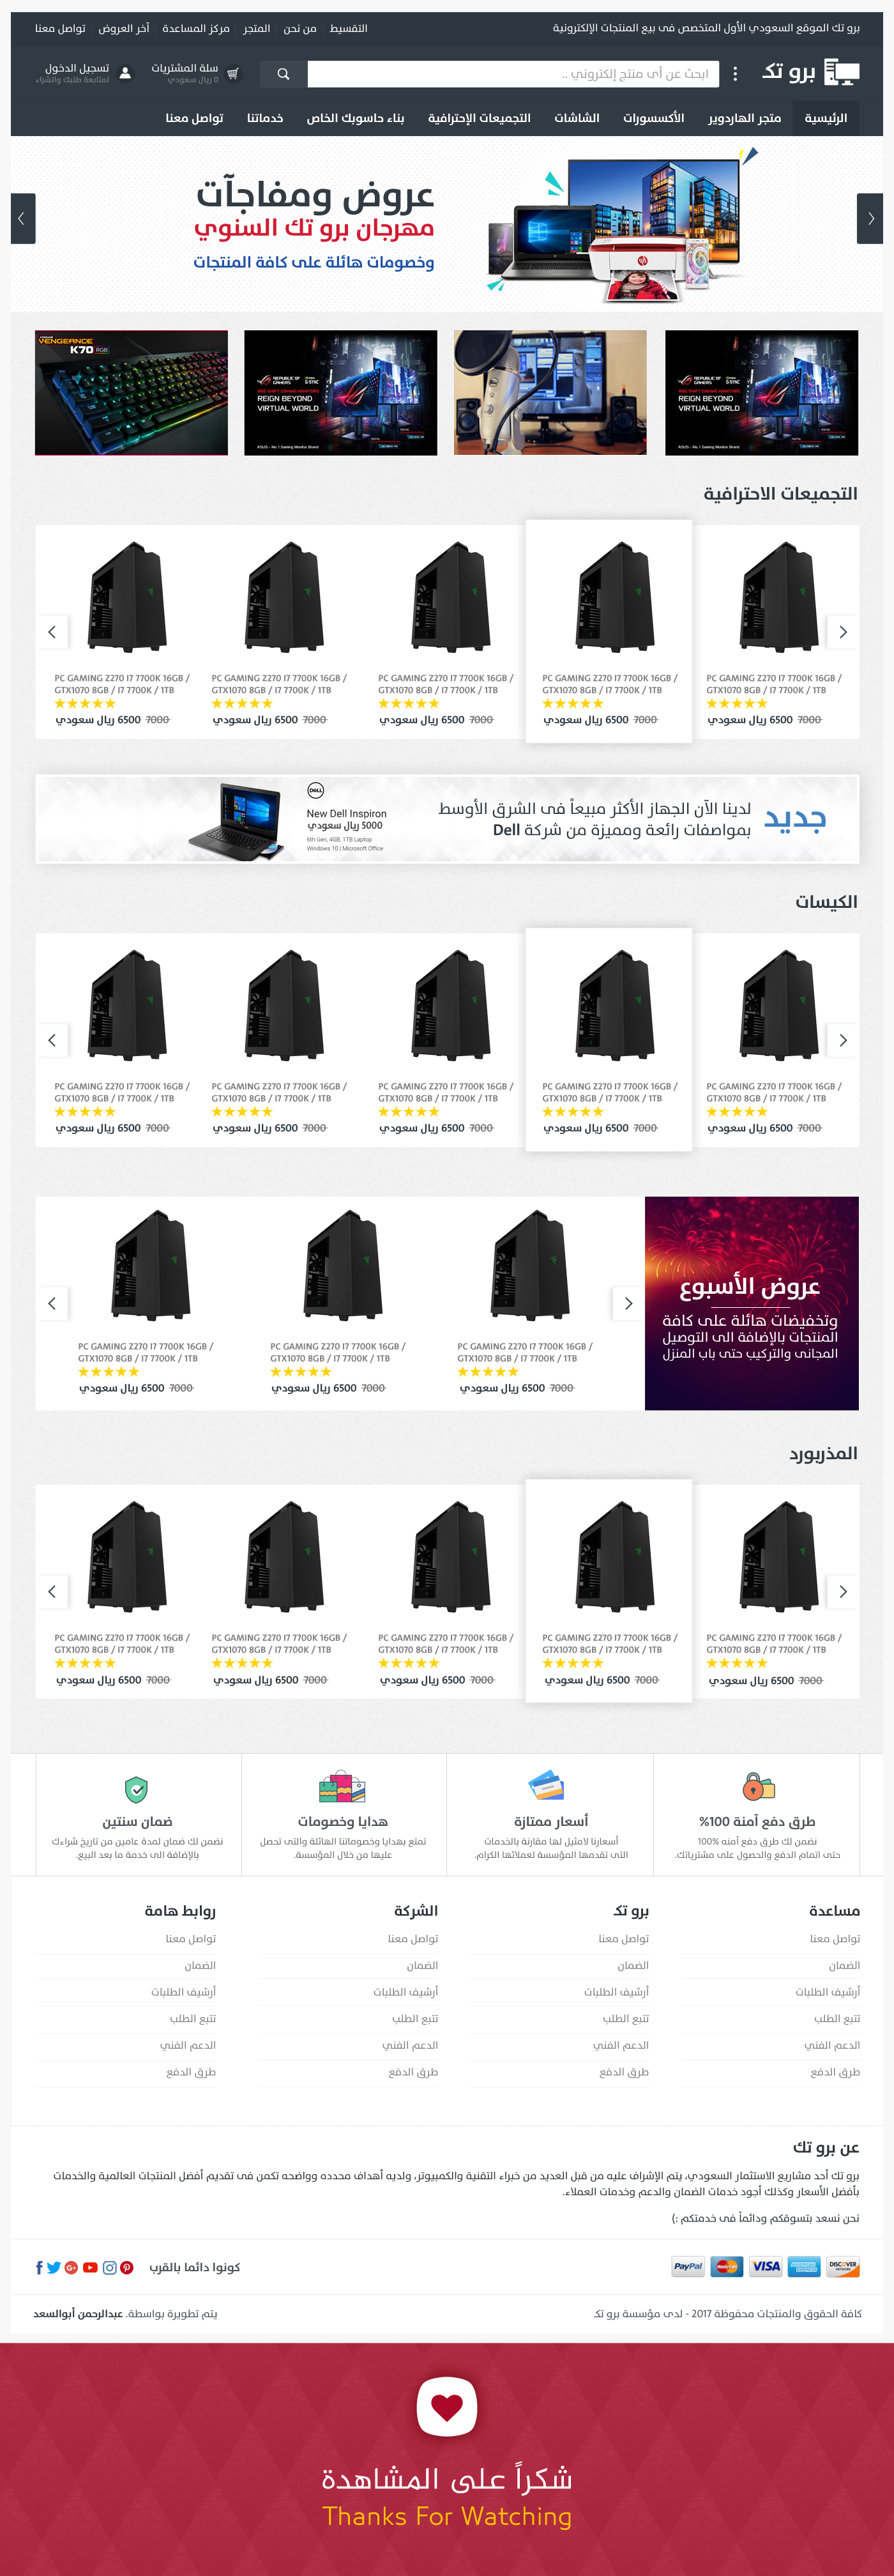 souq,design,Online shop,computer shop,aboelsaad,Sample Design